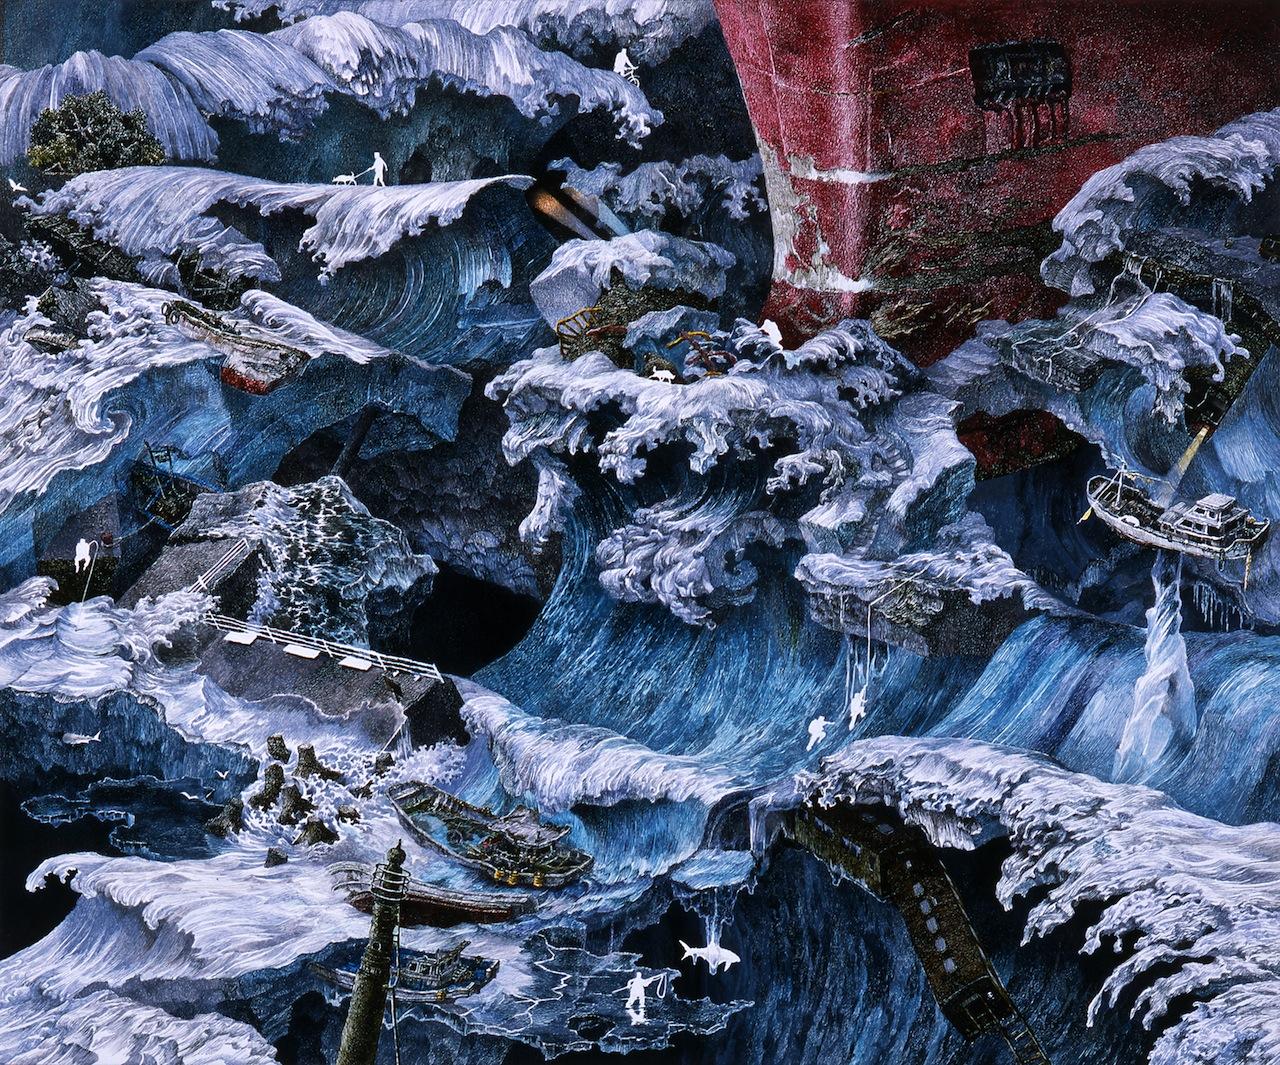 Manabu Ikeda, (b. 1973), Ice Stream (Episode from Foretoken), 2009. Pen, acrylic ink on paper, mounted on board; 13 4/5 x 17 5/7 in. Private Collection, New York. © Manabu Ikeda, courtesy Mizuma Art Gallery. Photo by Kei Miyajima.